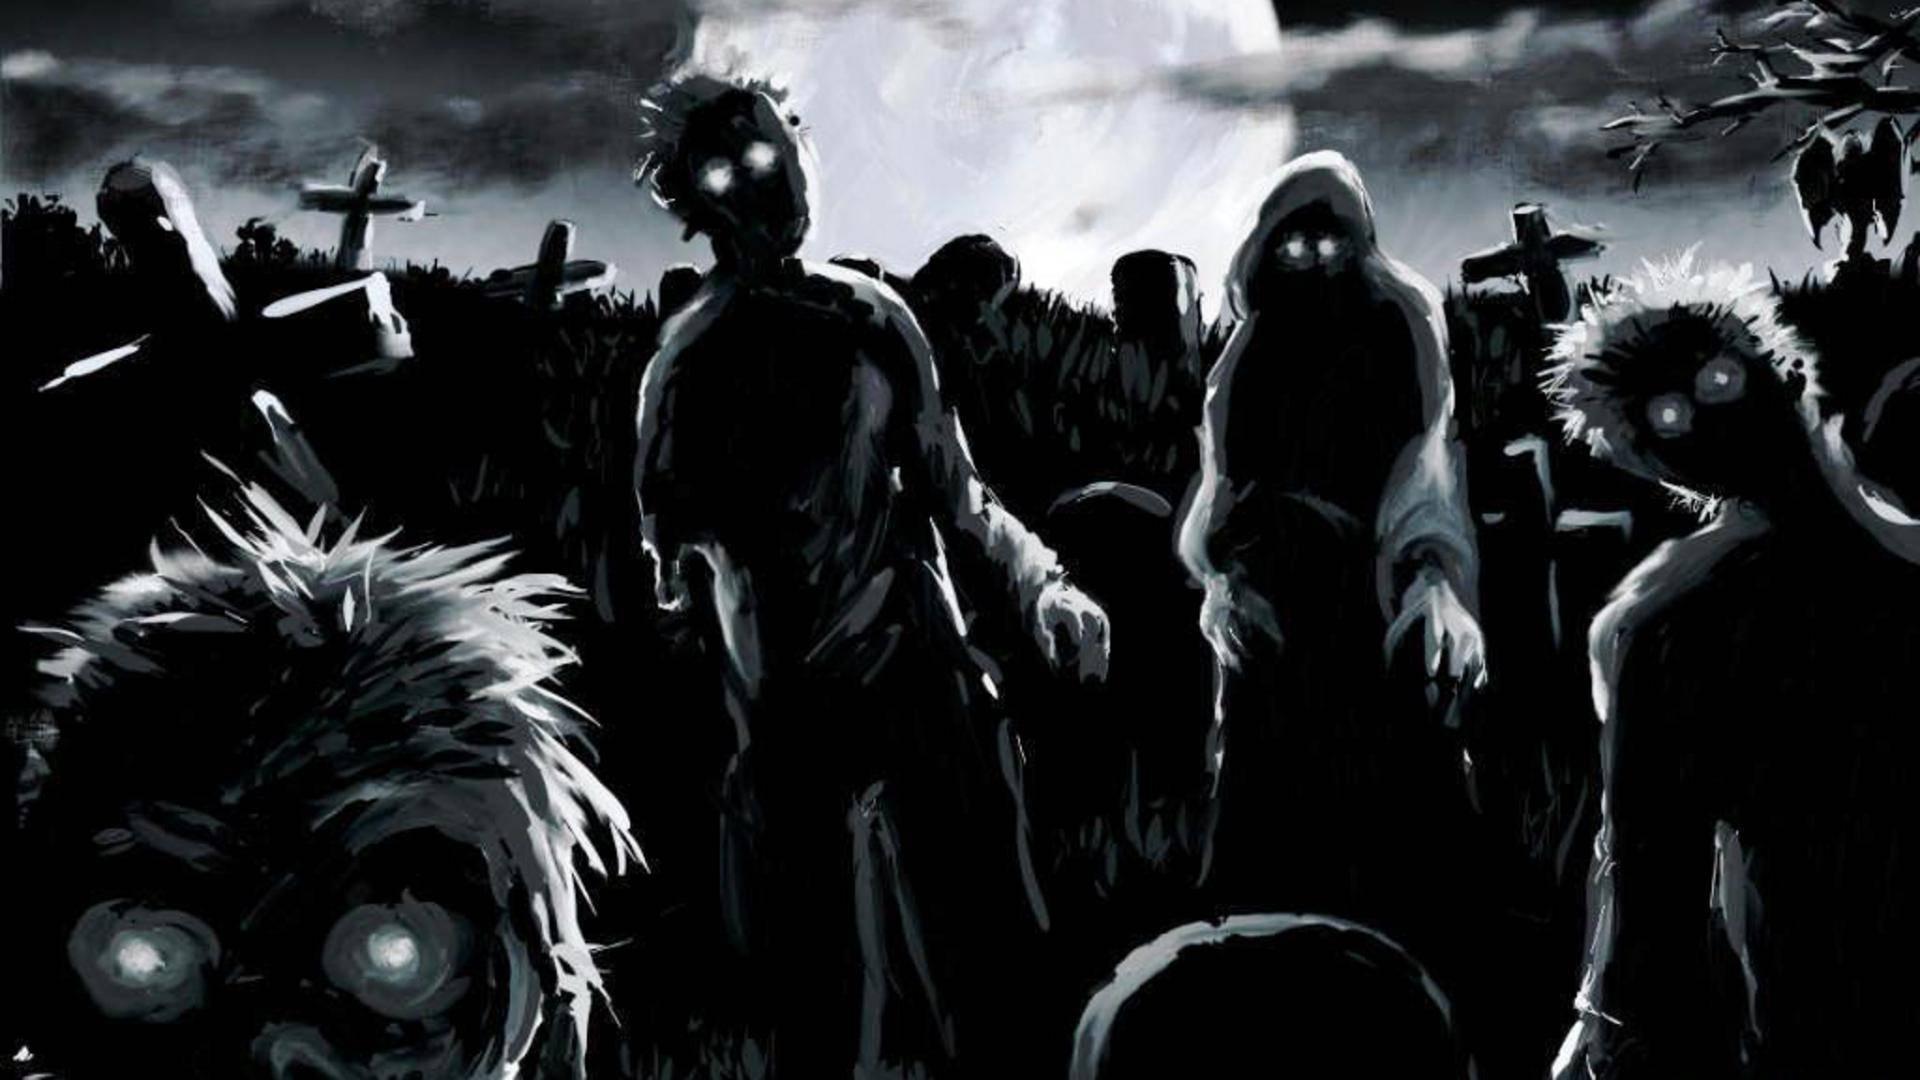 Fondos De Pantalla Wallpapers Gratis Zombies Wallpaper Full Hd